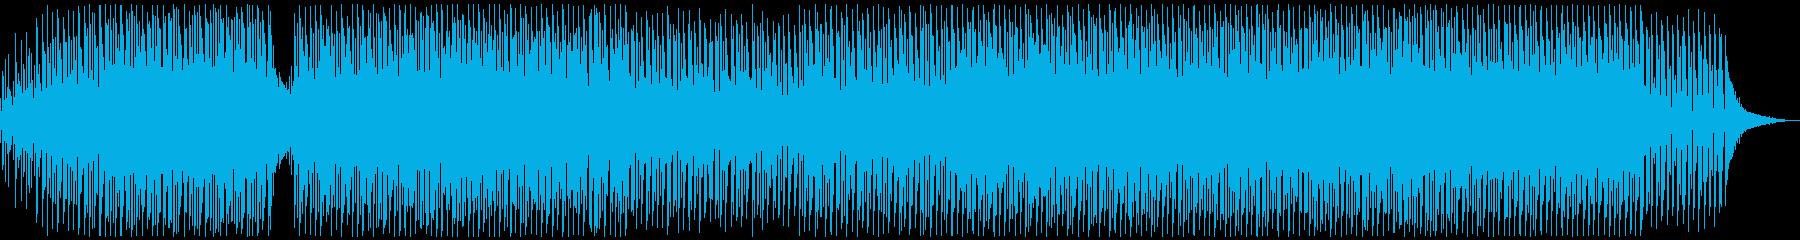 EDM、ストリングス、ギターのダン...の再生済みの波形